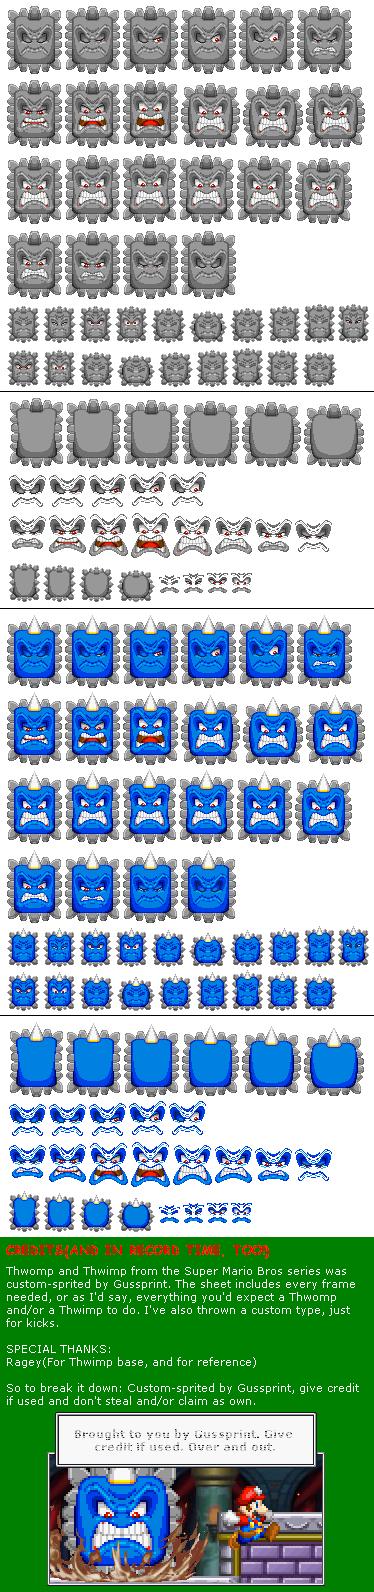 Custom Edited Mario Customs Thwomp The Spriters Resource